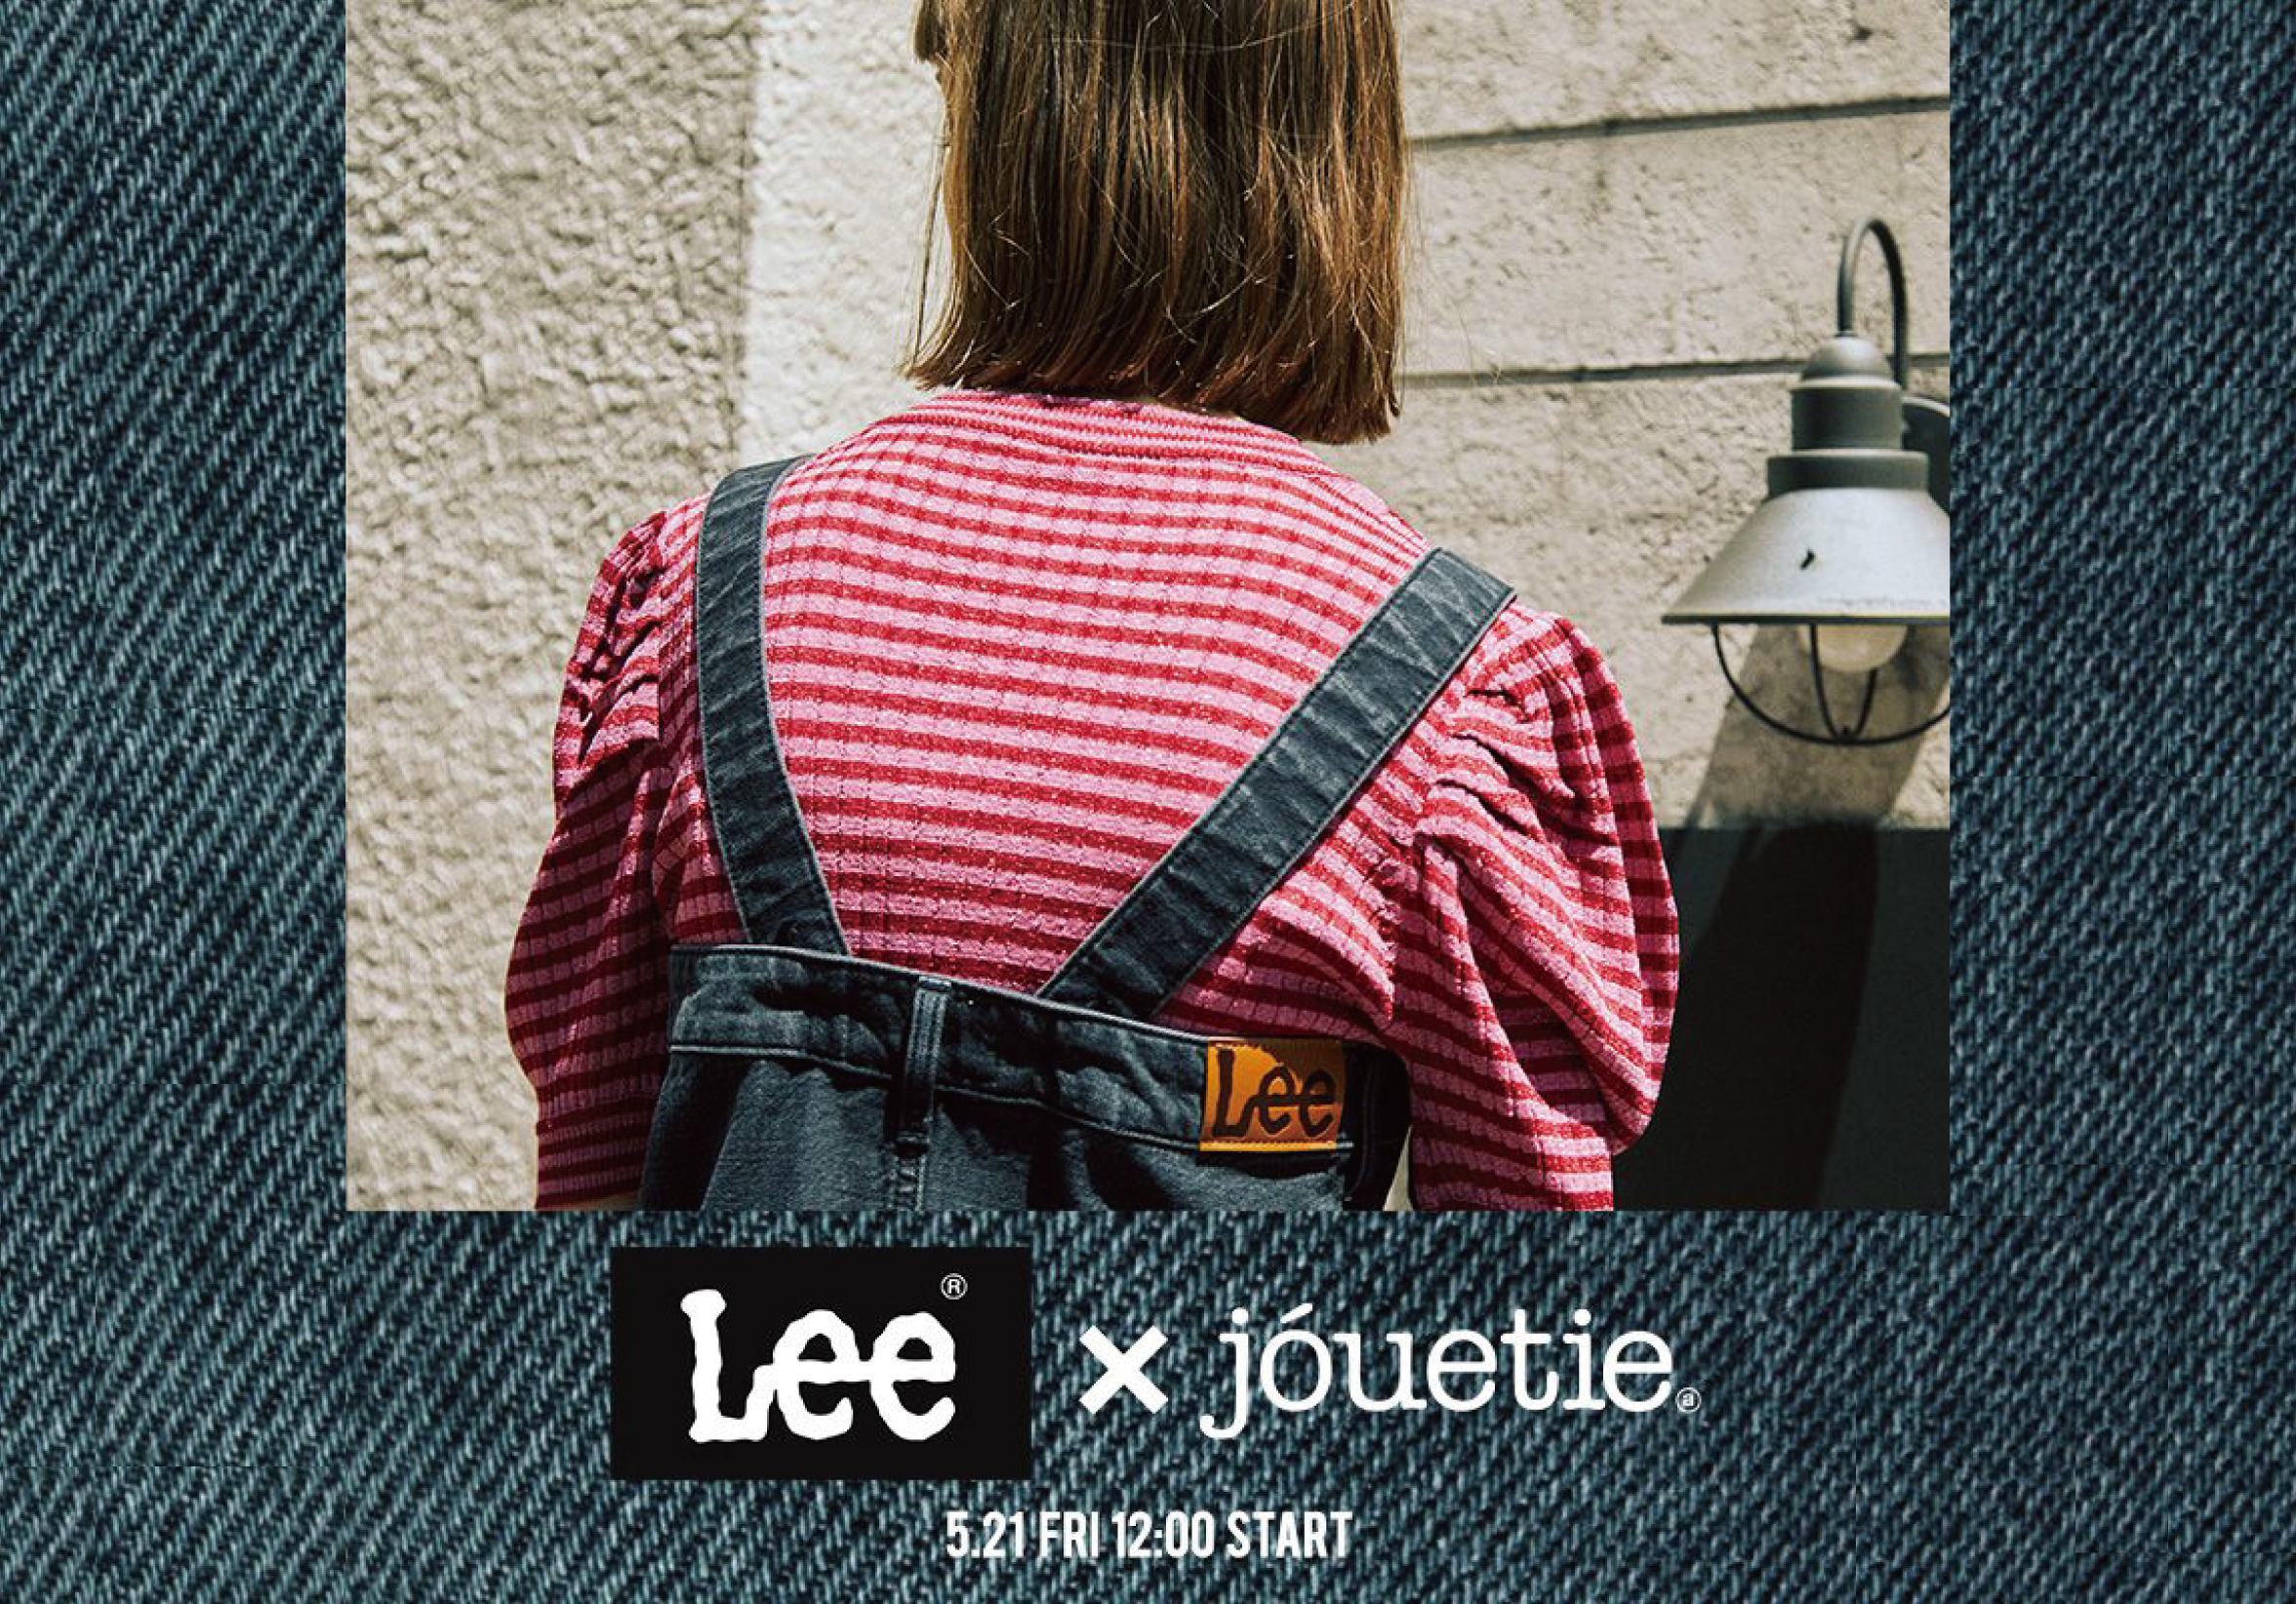 【SPECIAL COLLABORATION】Lee ×jouetie